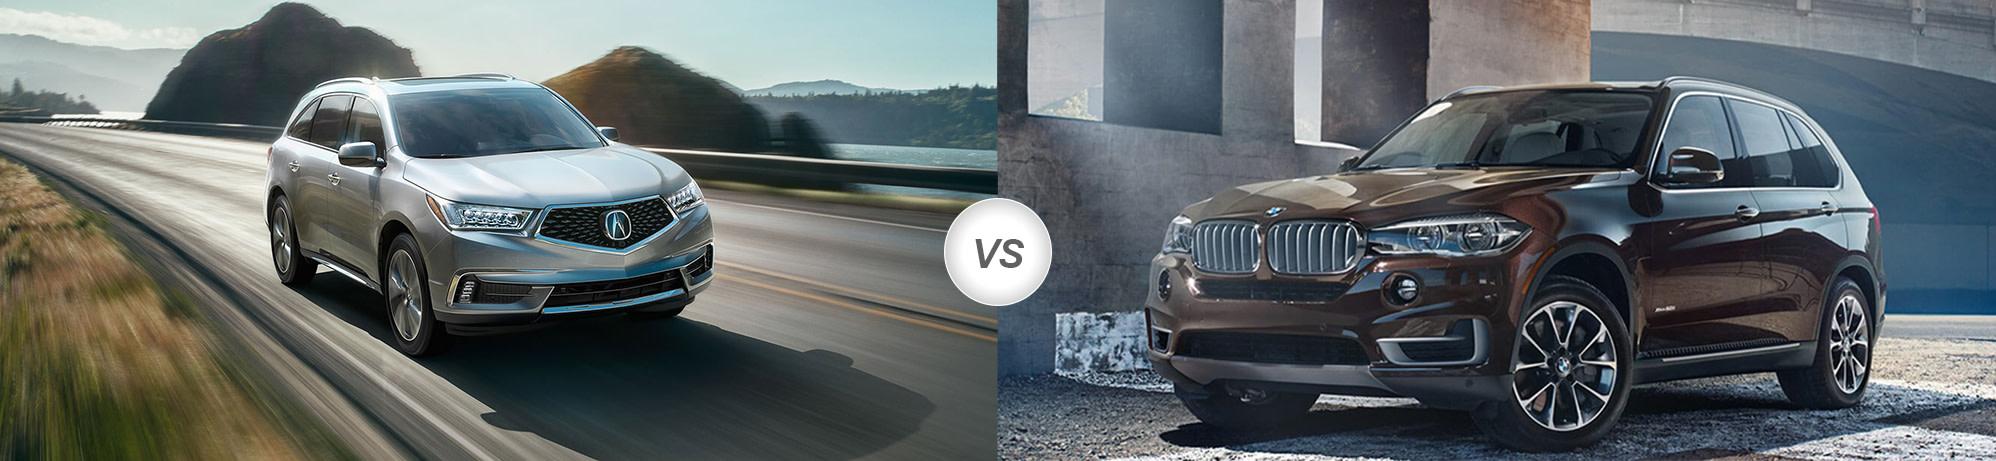 2018 Acura MDX vs 2018 BMW X5 | Compare Specs - Pohanka Acura on